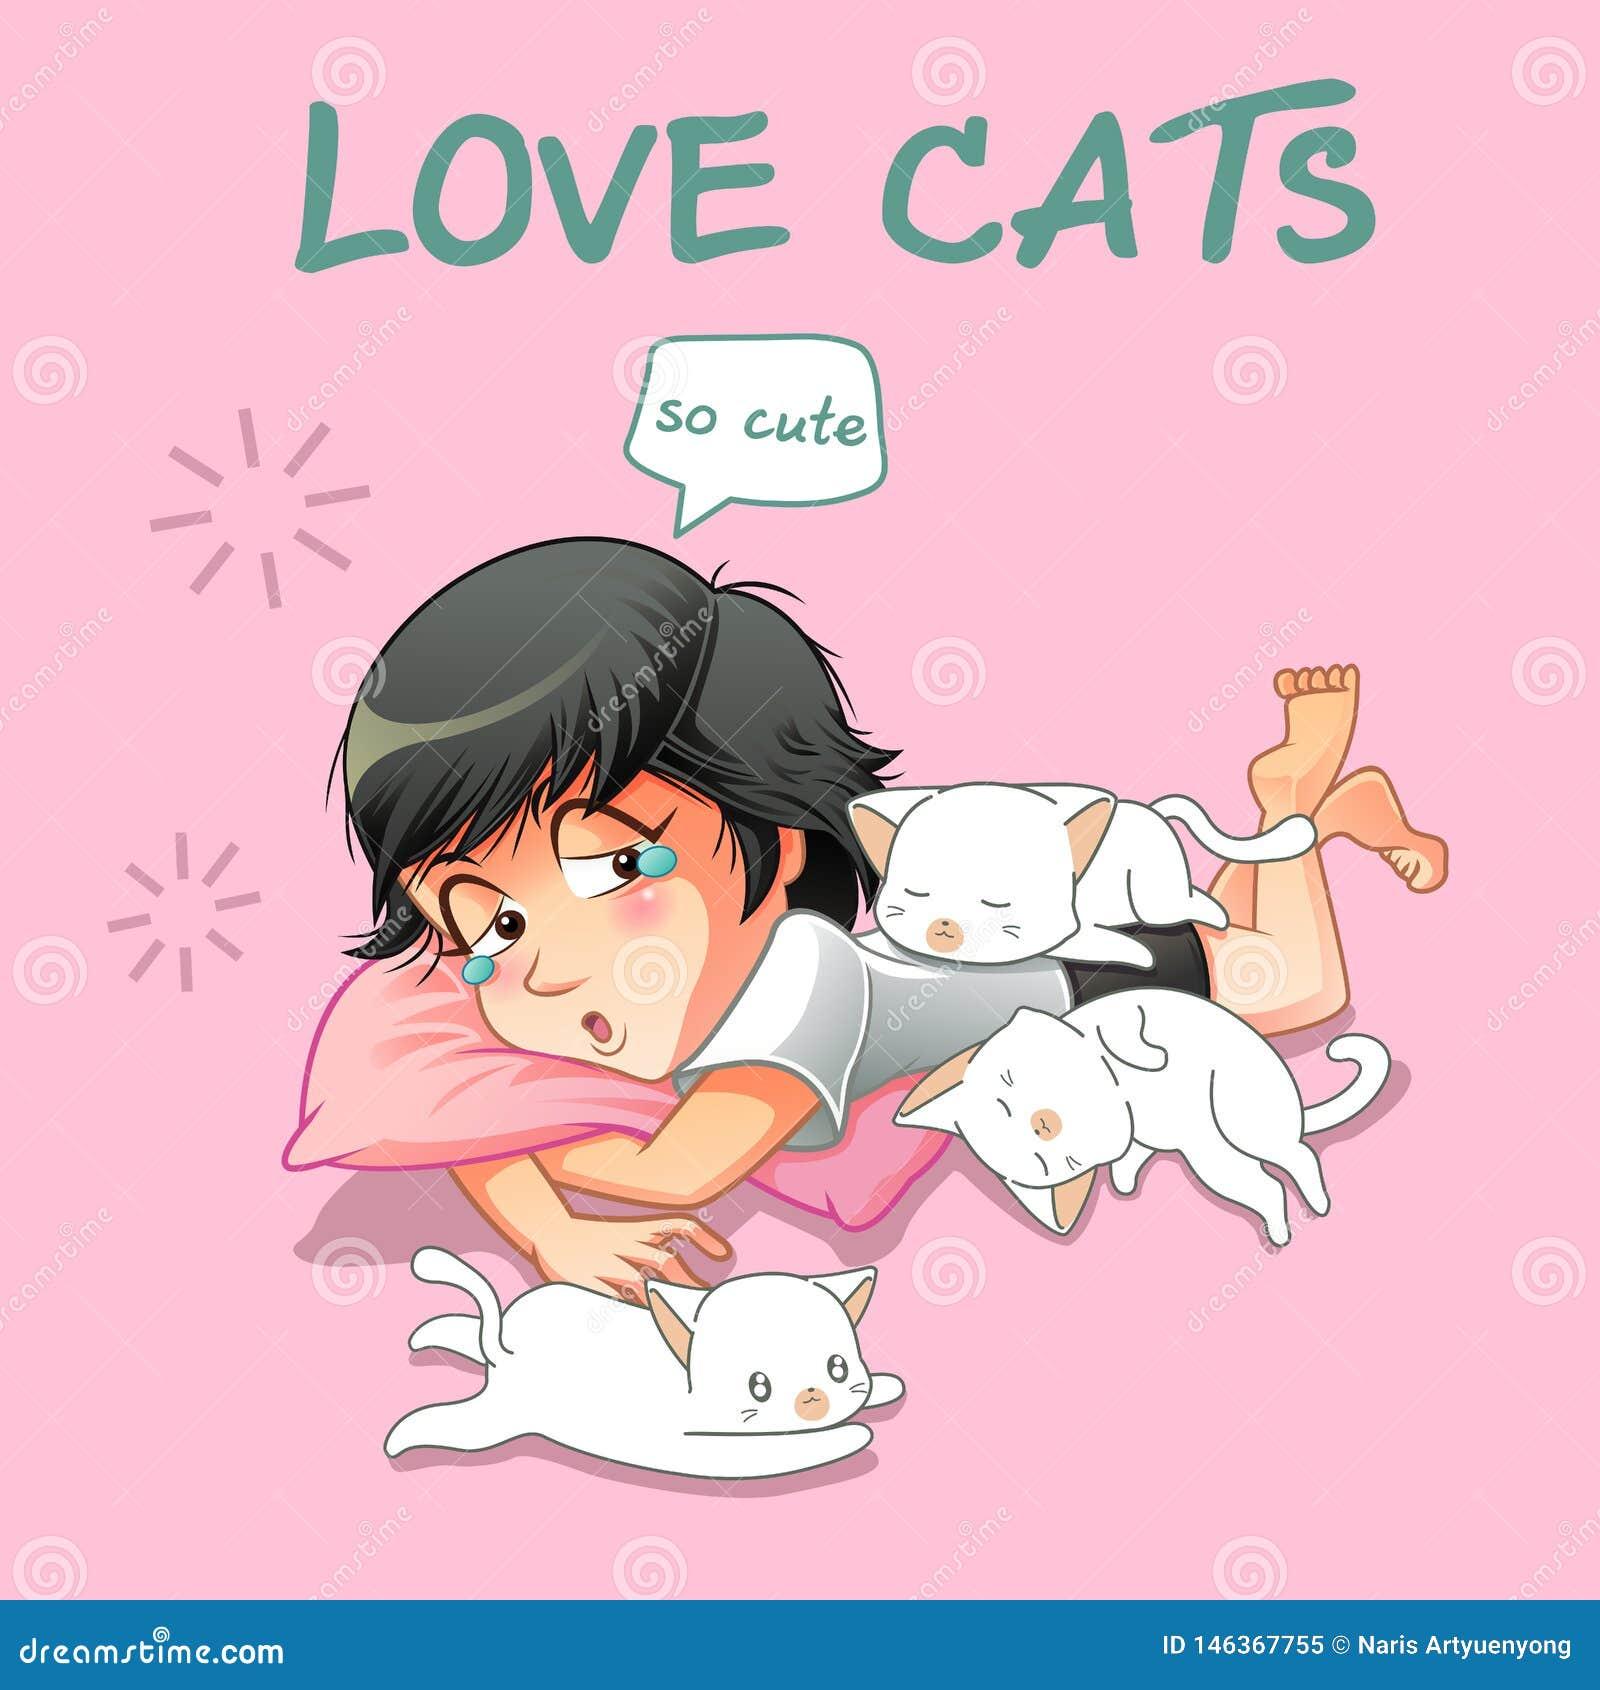 Elle aiment de petits chats